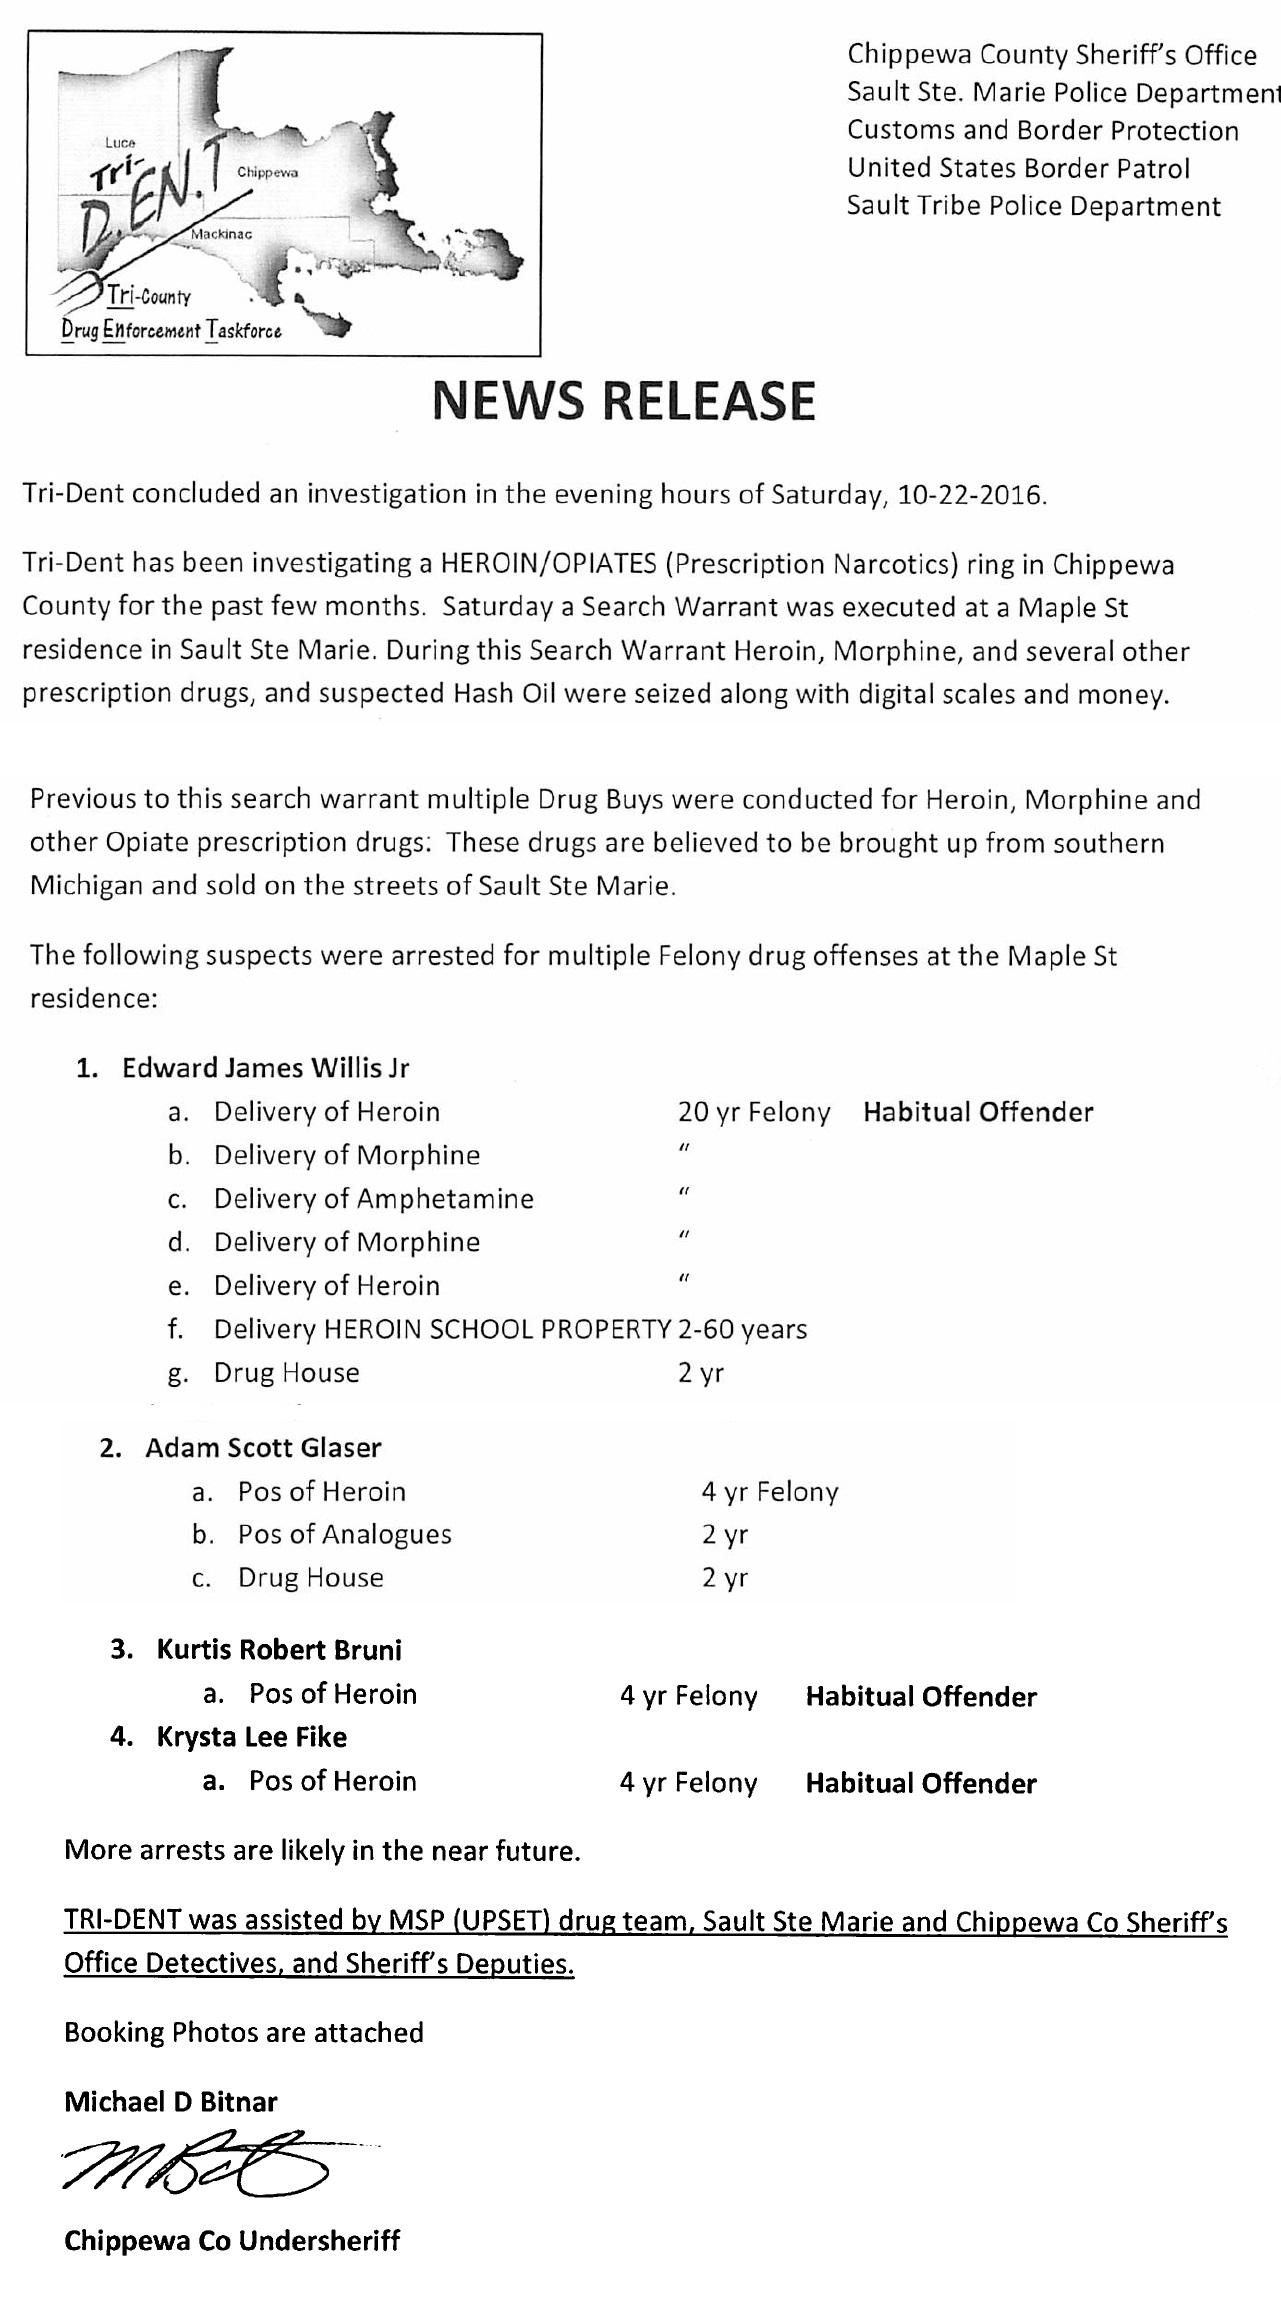 new*new*11yo pthc ... trident-press-release ...